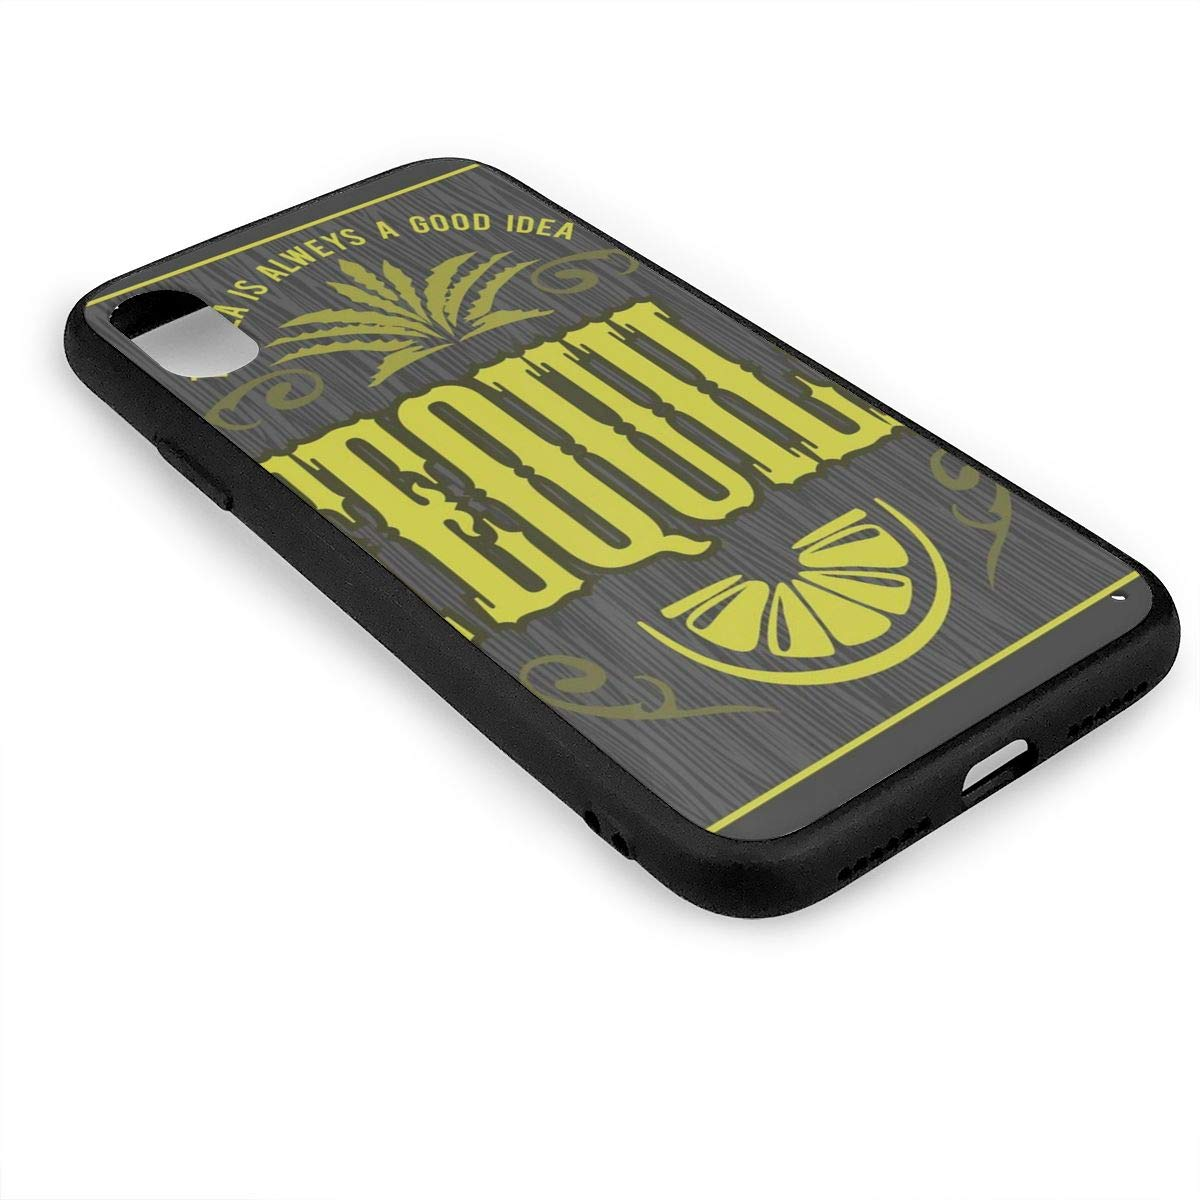 Amazon.com: Funda para iPhone X/iPhone XS, todo lo que ...